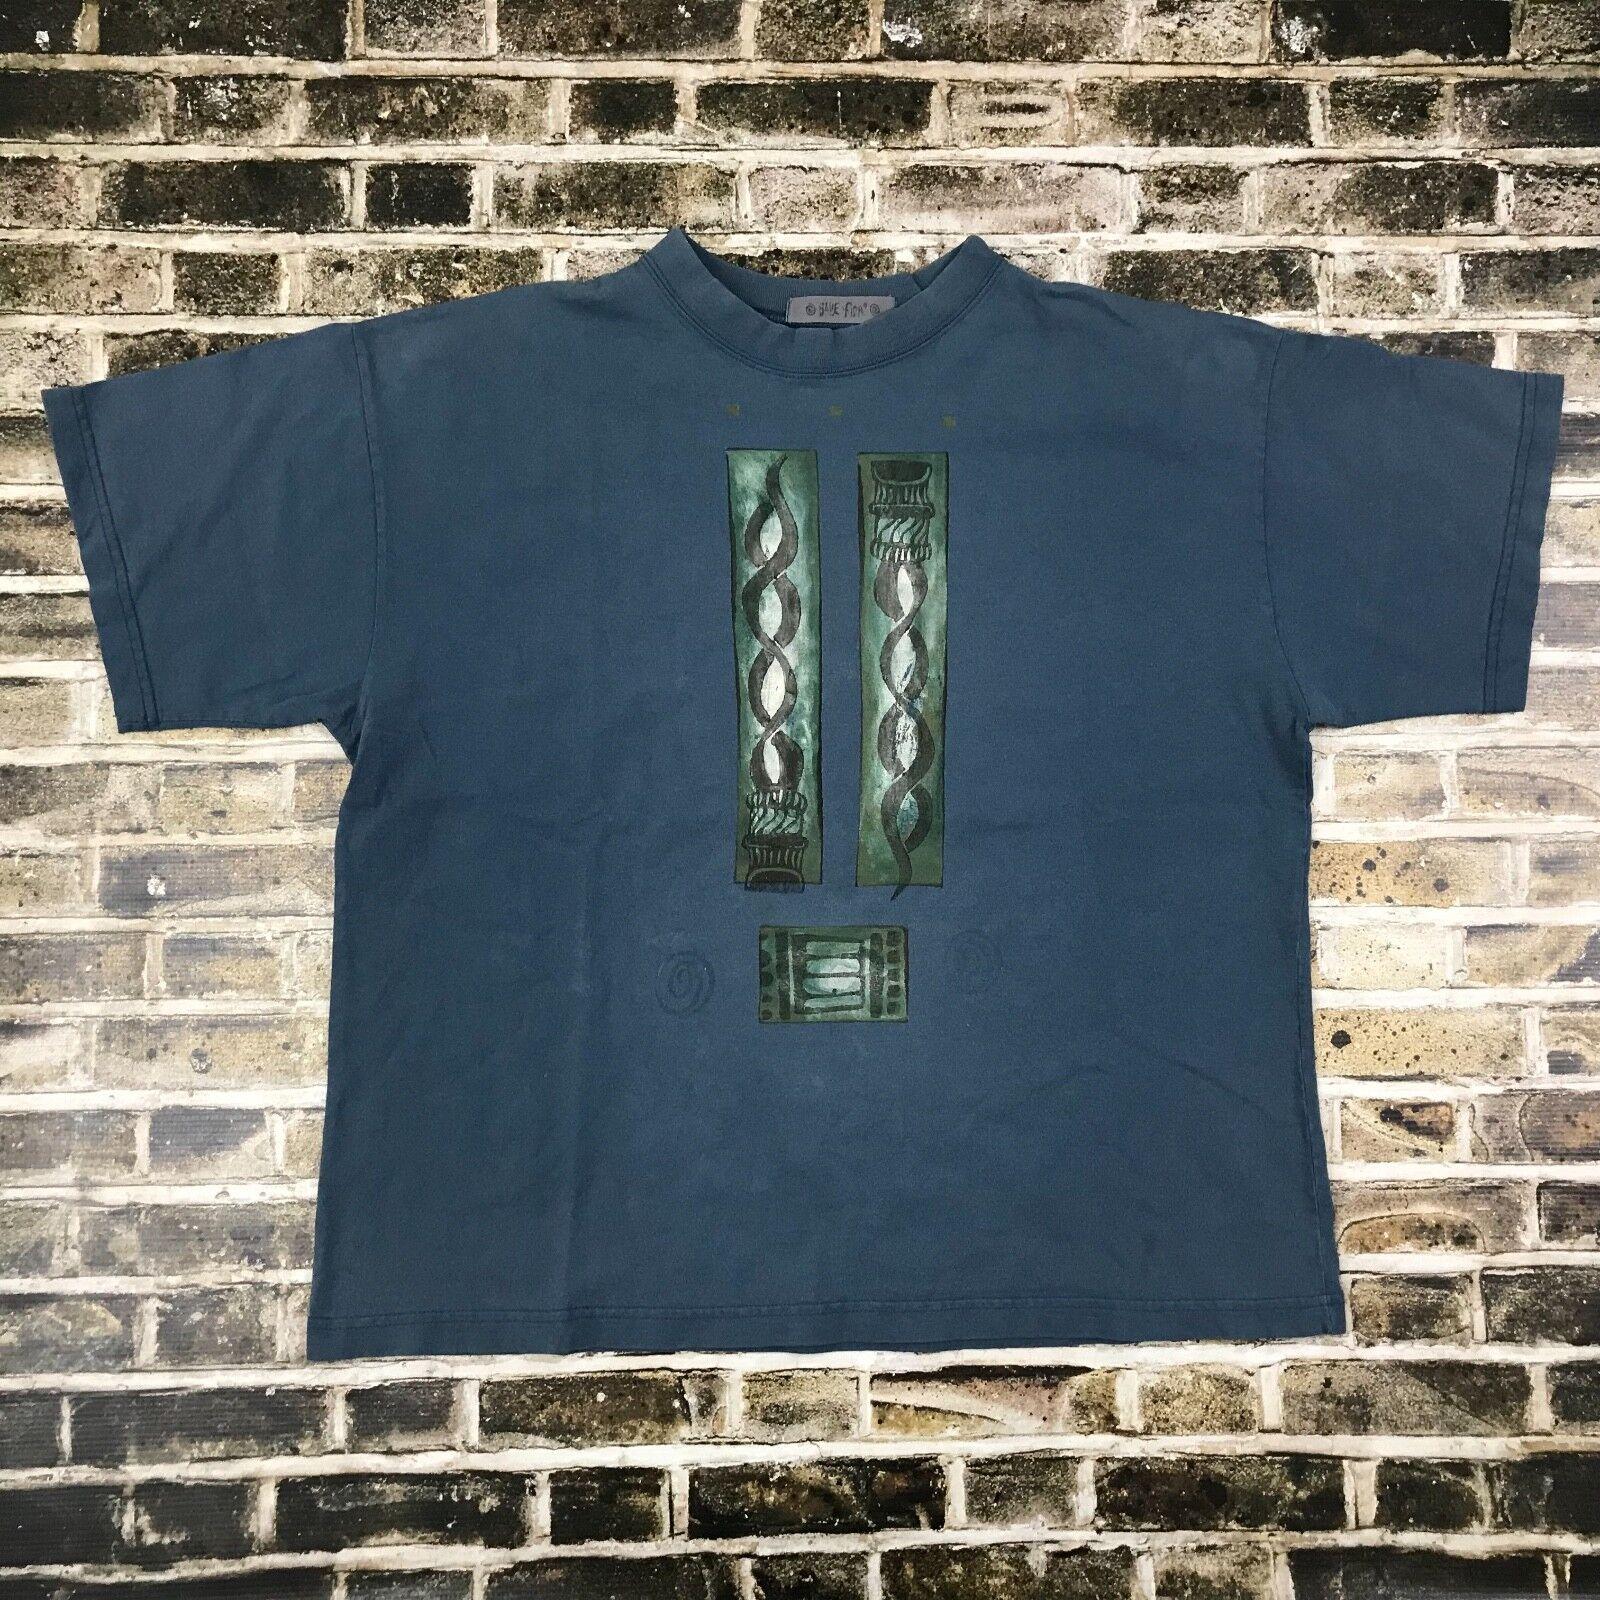 BLUE FISH T shirt - Large - Blue USA Made Hand Pri